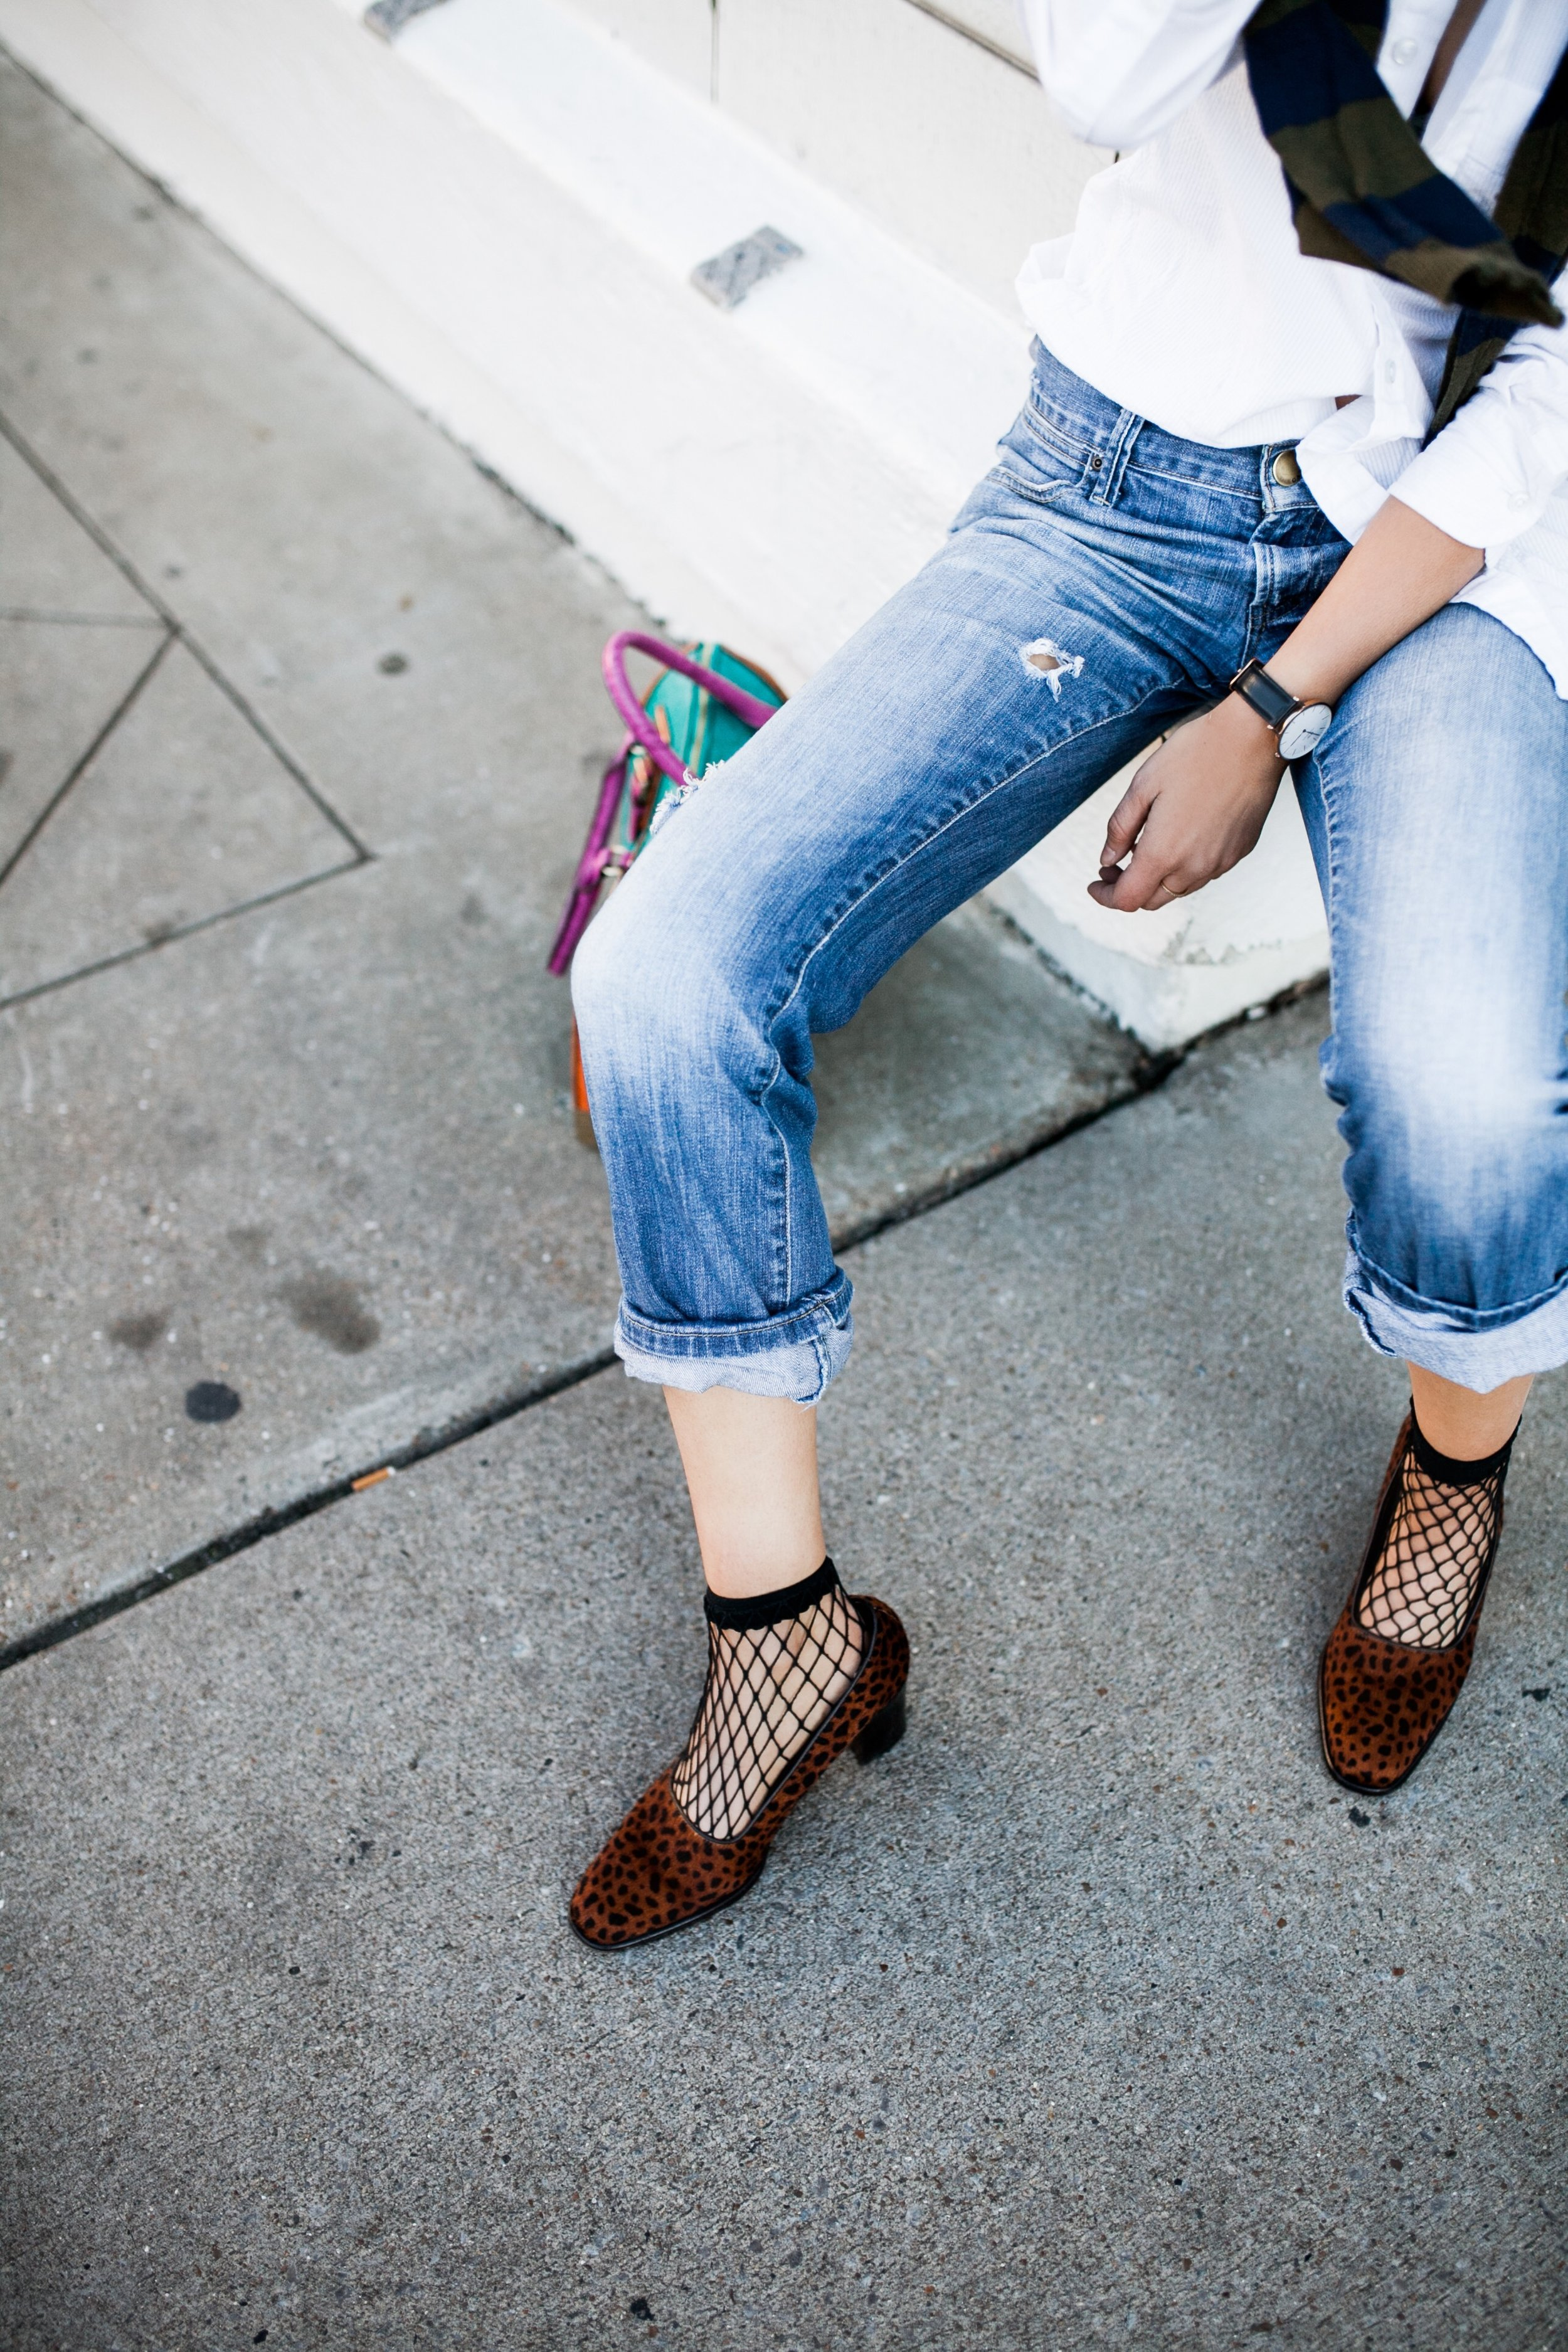 how-to-wear-the-fishnet-sock-trend-2.JPG